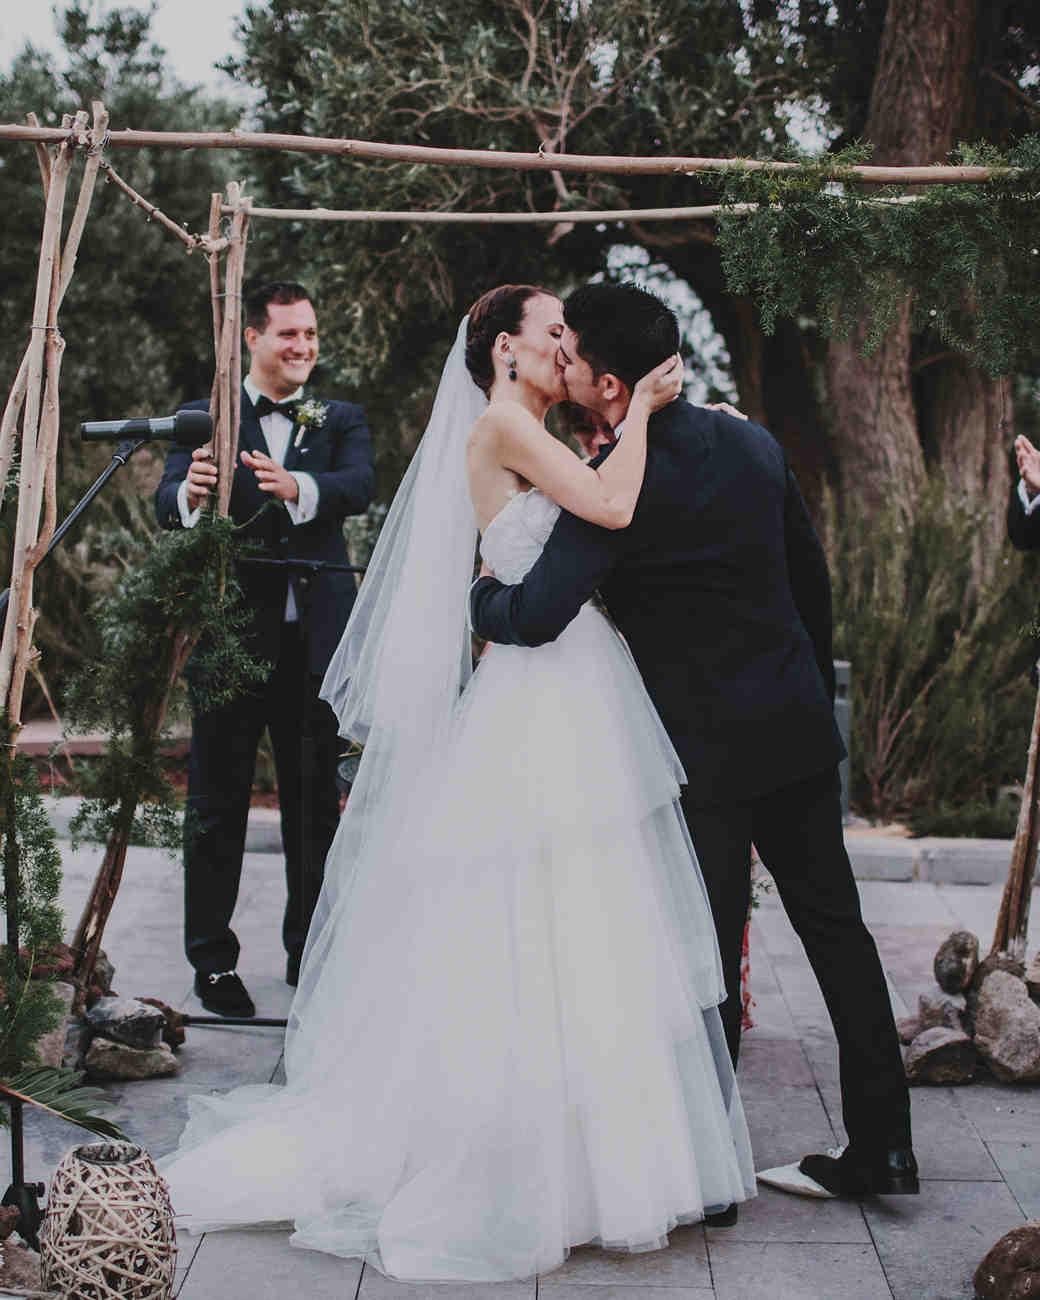 tamara-brett-wedding-ceremony-1240-s112120-0915.jpg